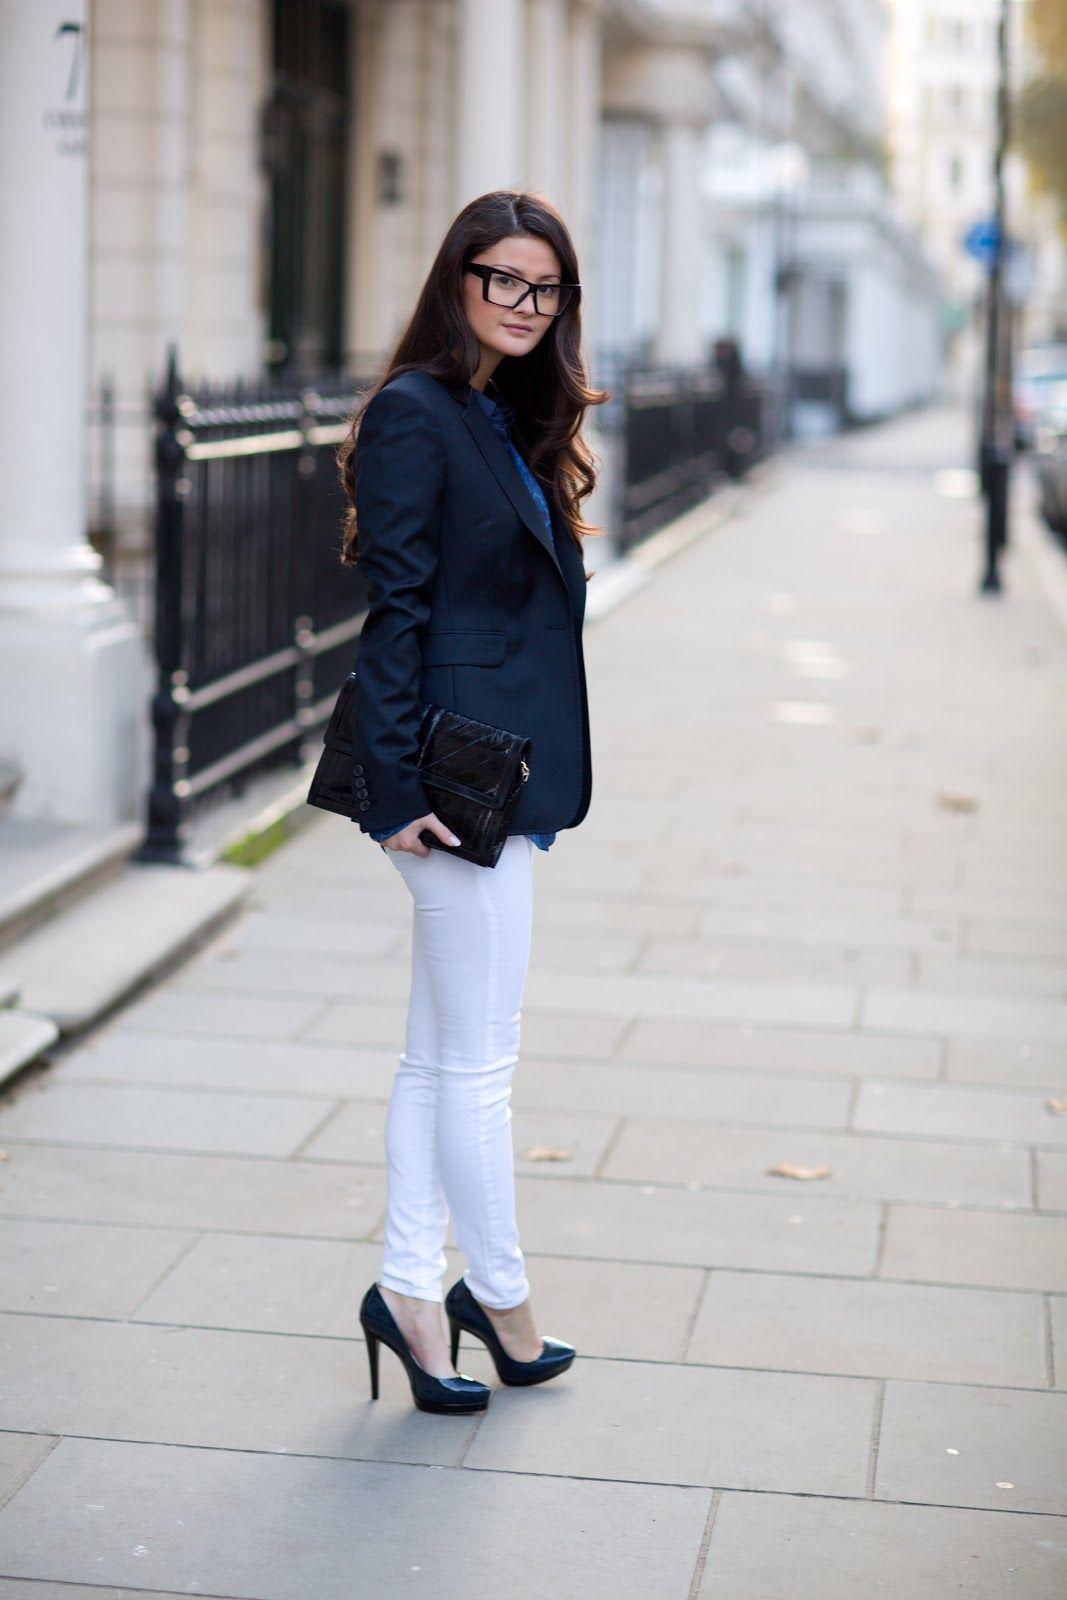 bc6f8fbec6a navy blazer  white jeans  black heels  blue top